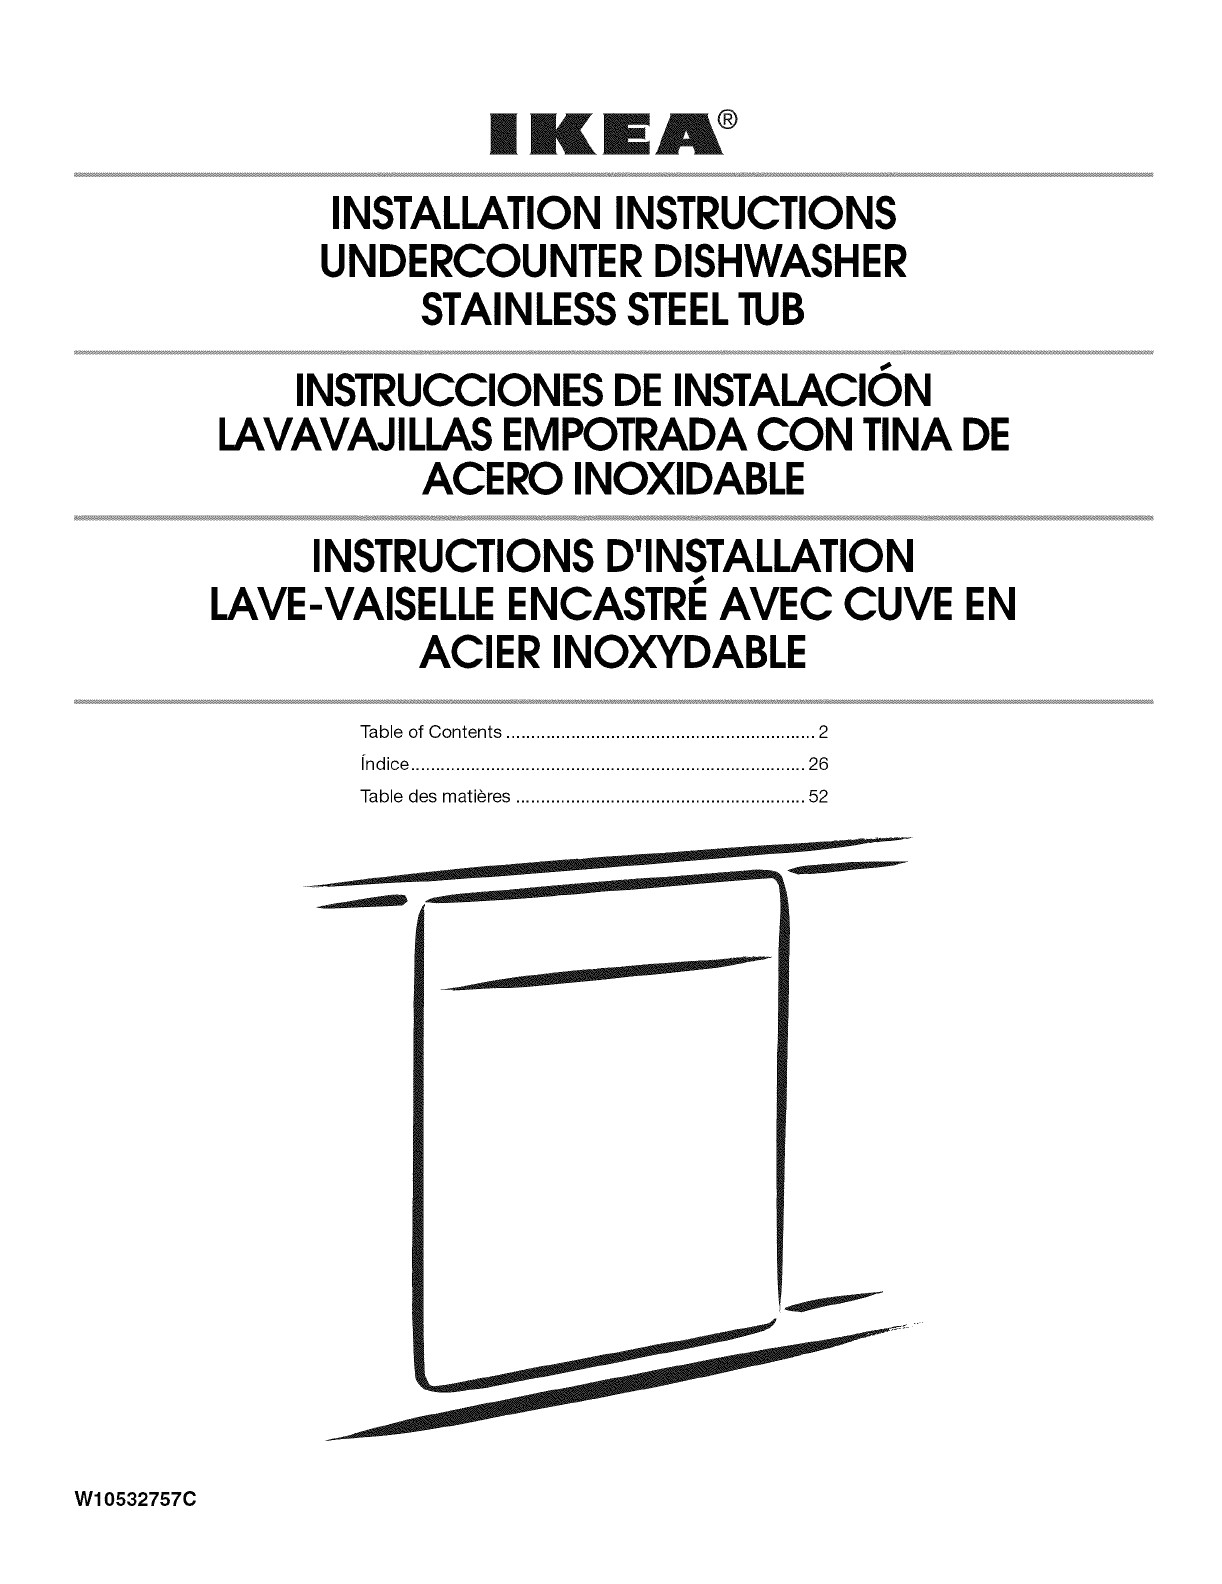 kea a installationinstructions undercounterdishwasher